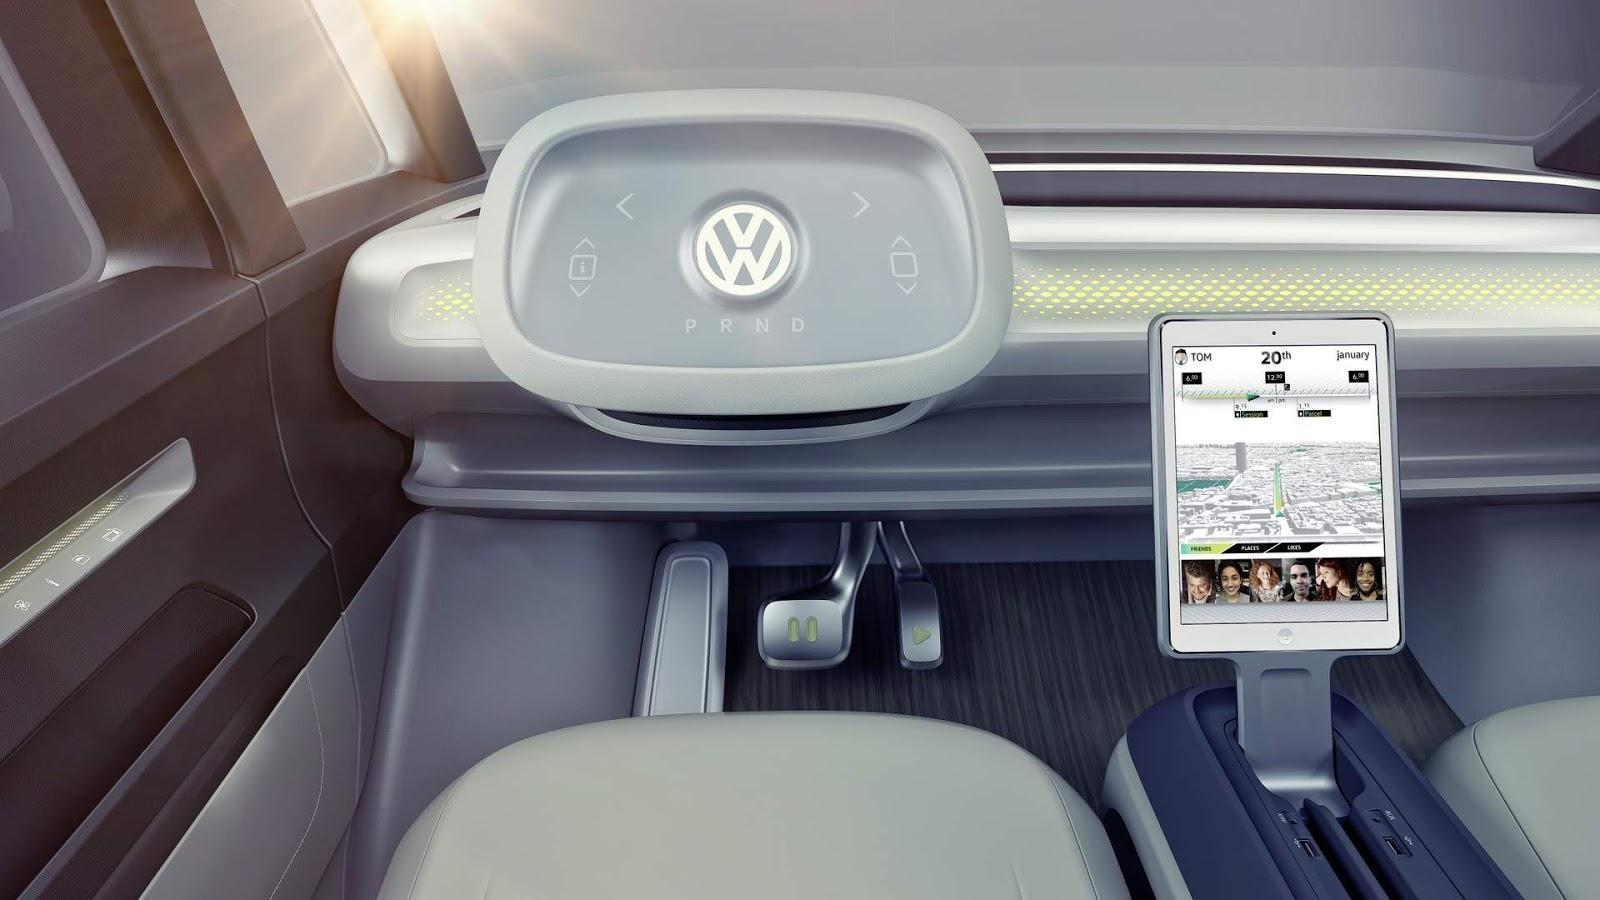 Volkswagen ID.Buzz autônomo chegará ao mercado em 2025